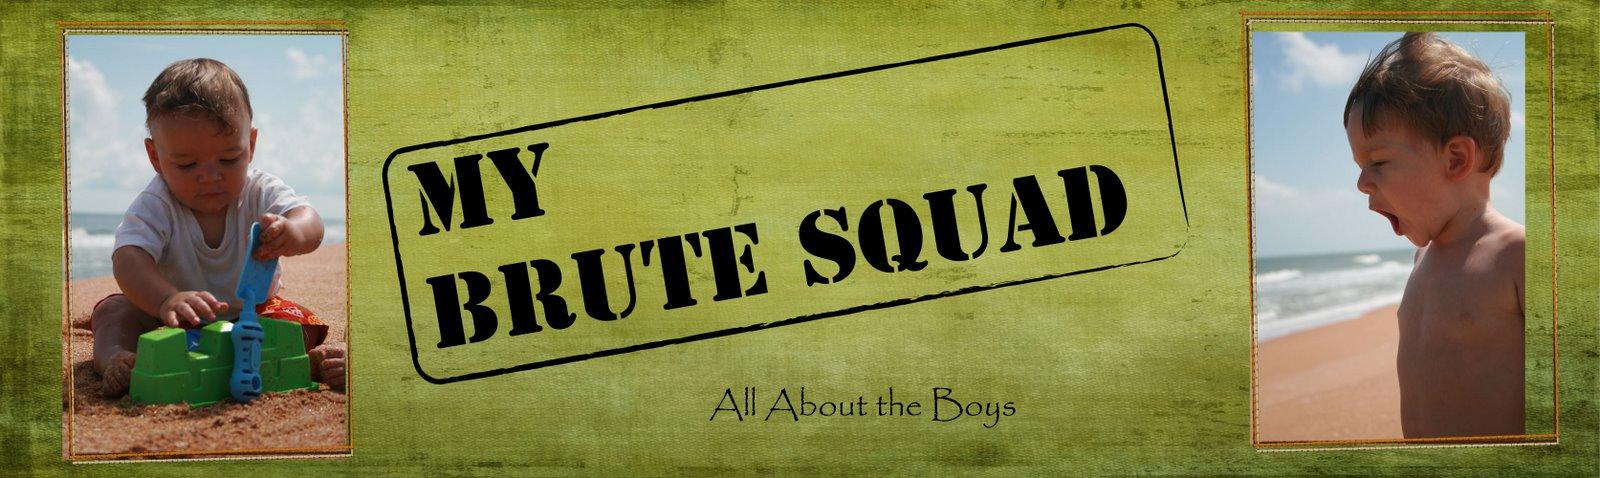 My Brute Squad